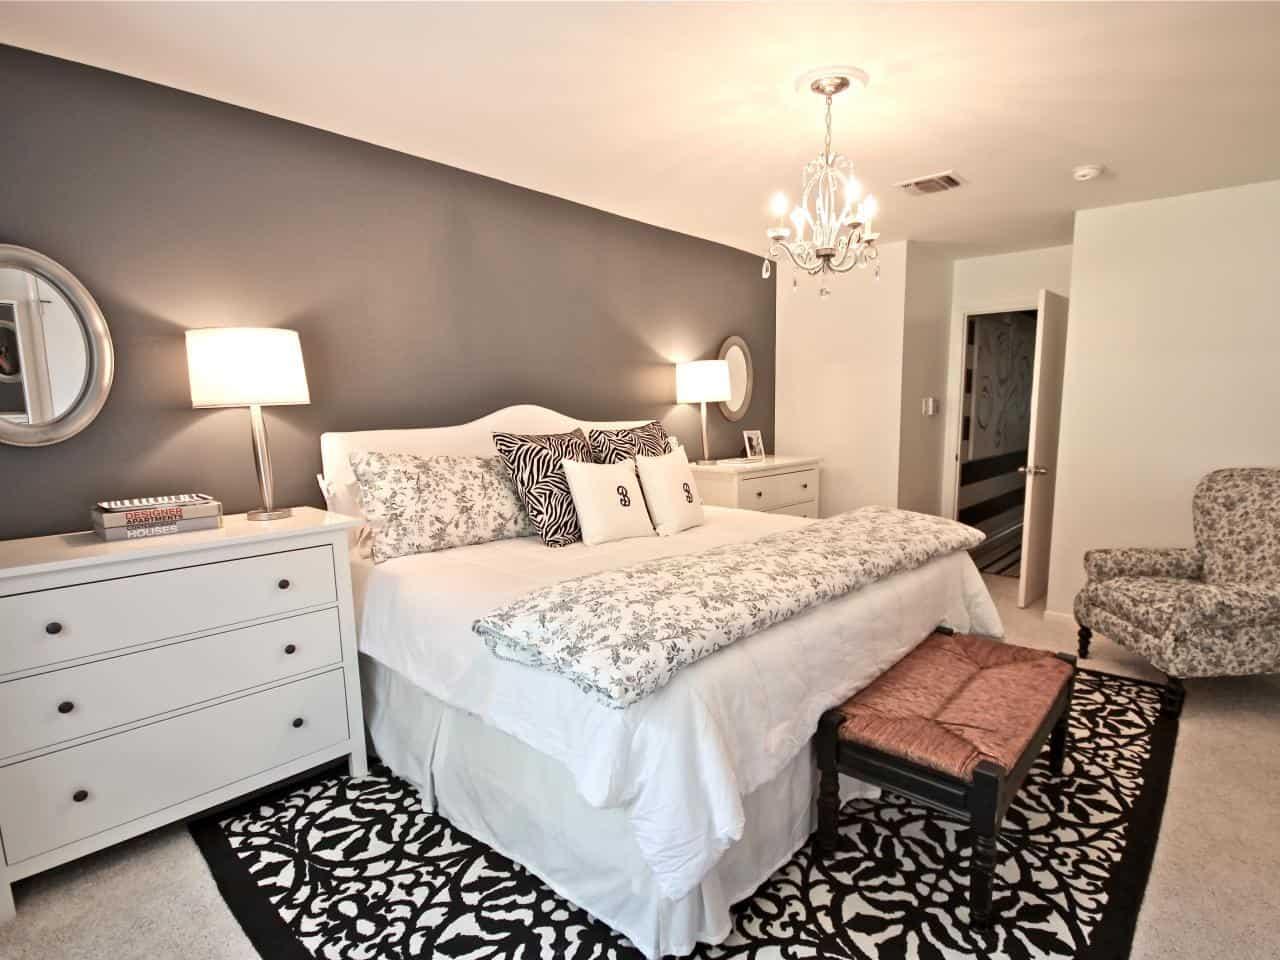 Photos Hgtv intended for Master Bedroom Chandelier